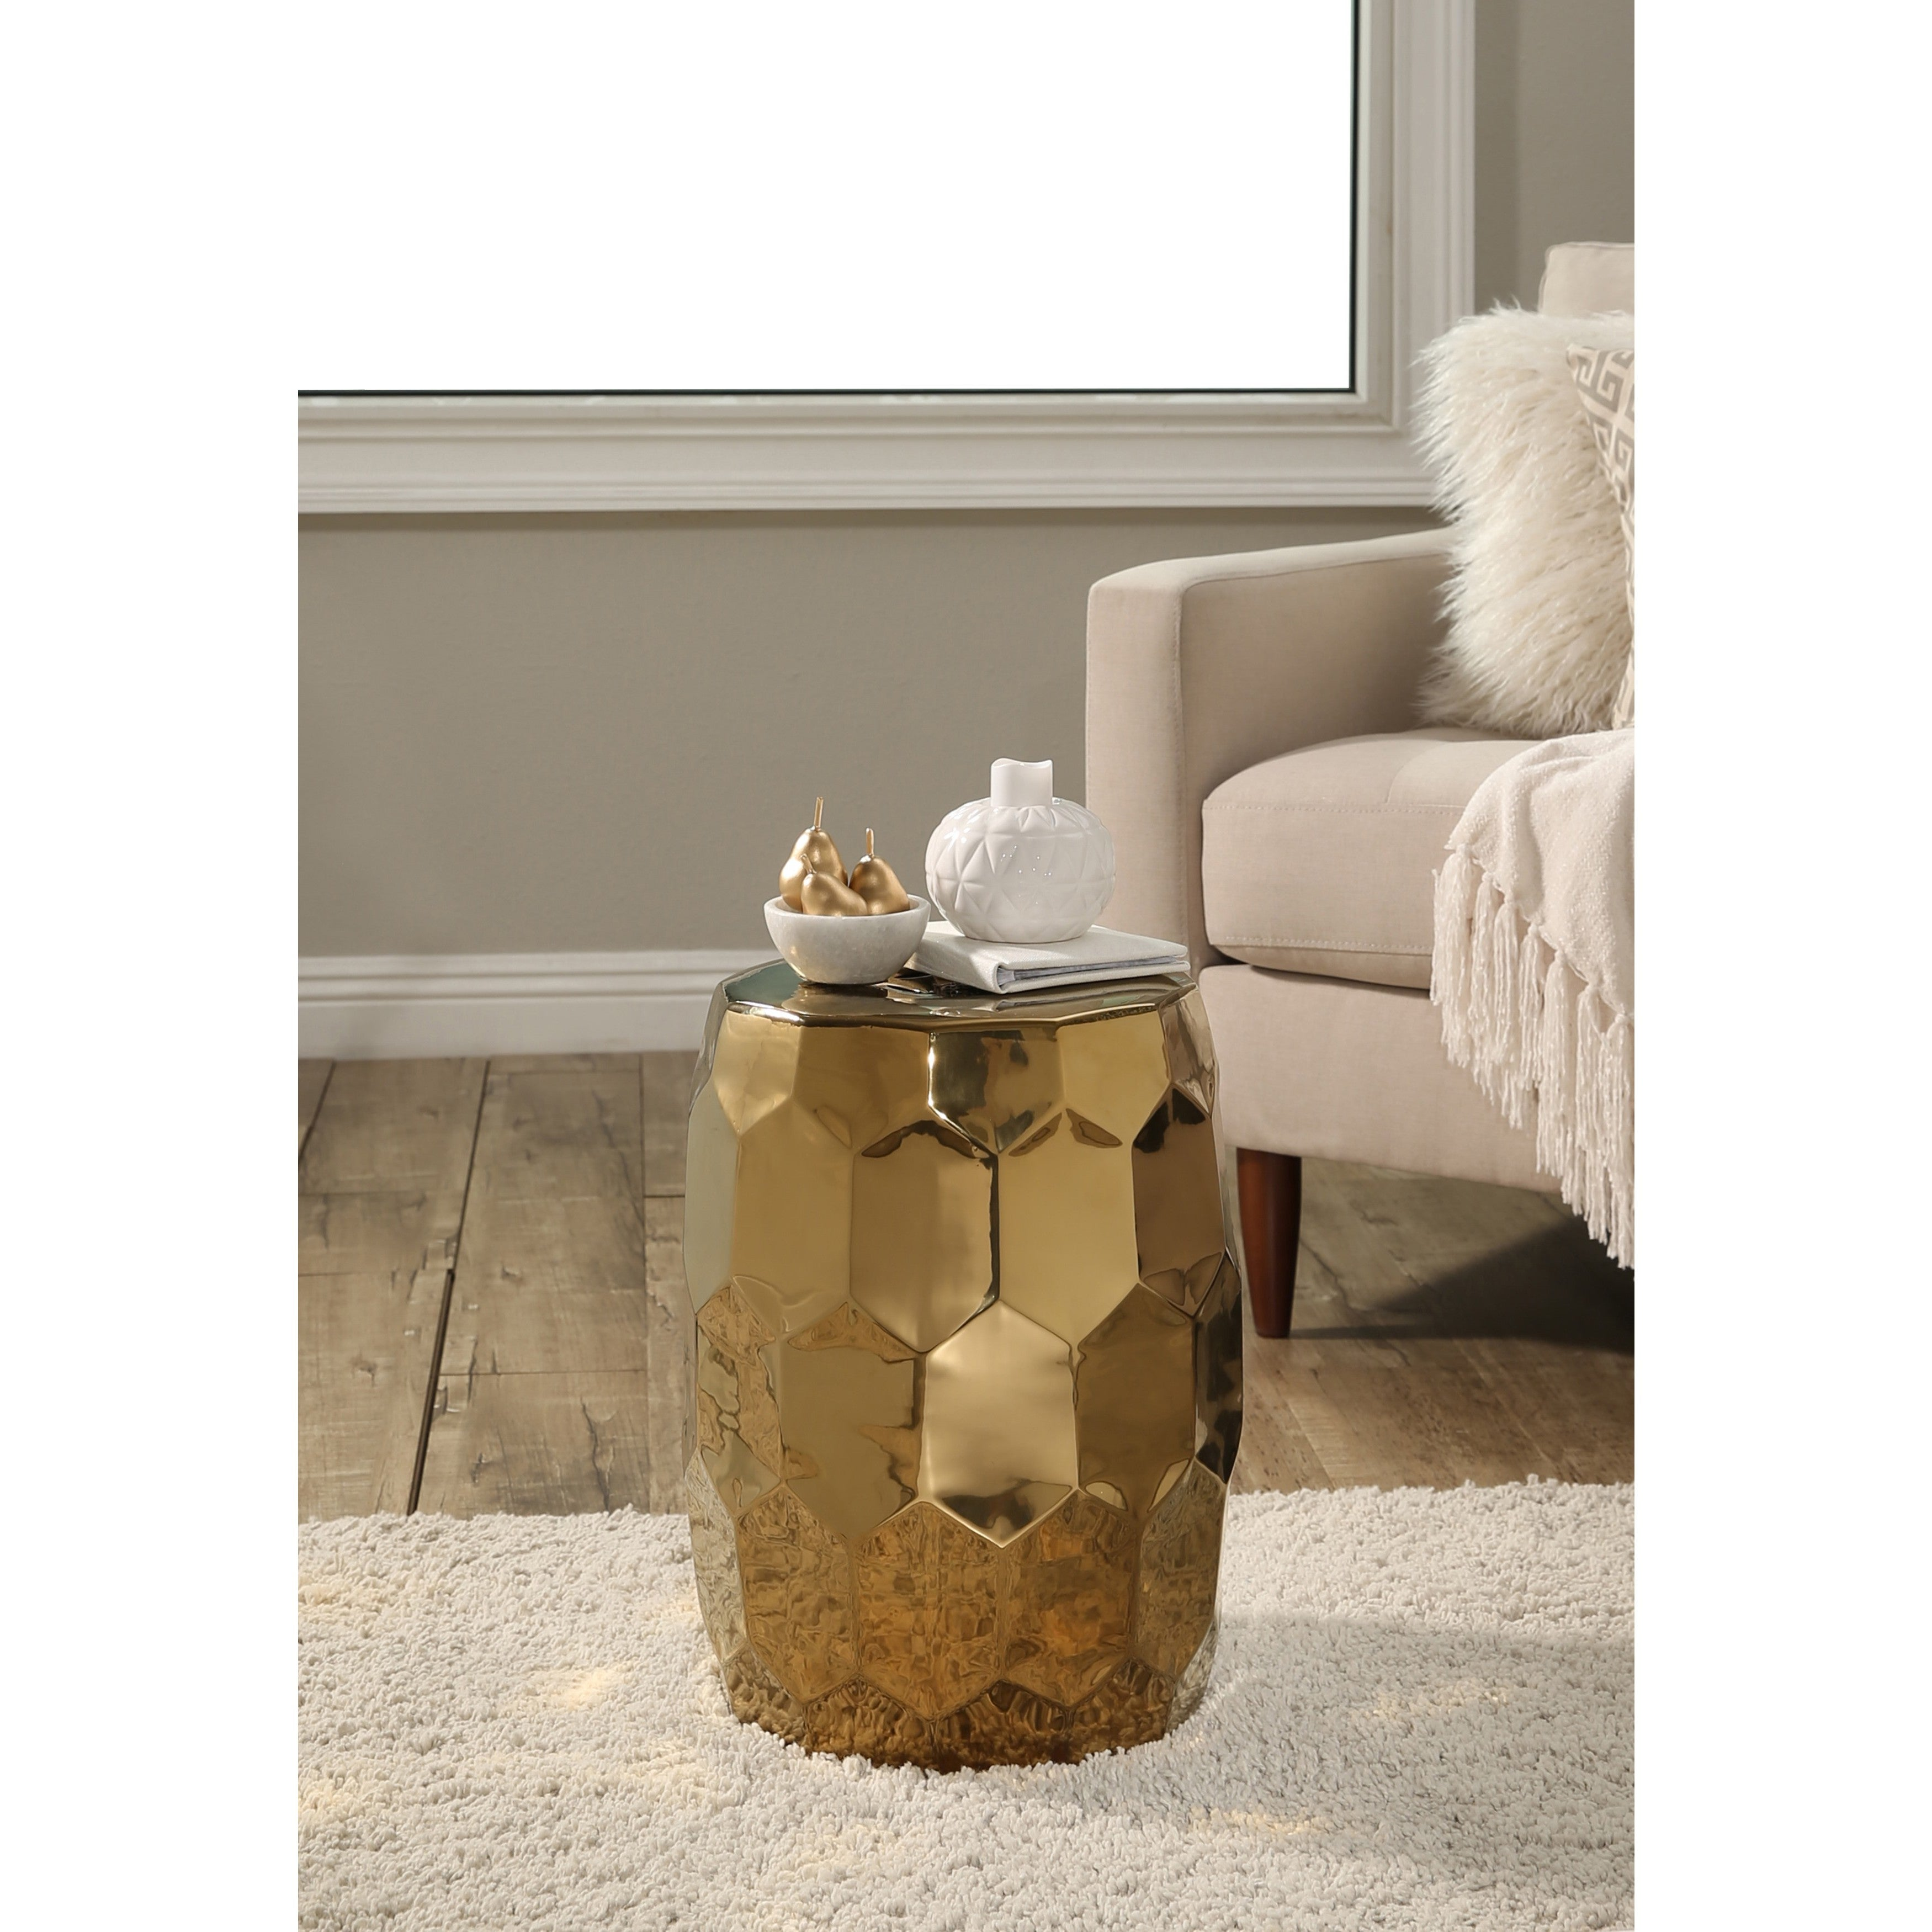 Shop Abbyson Milan Gold Chrome Ceramic Garden Stool - Free Shipping ...